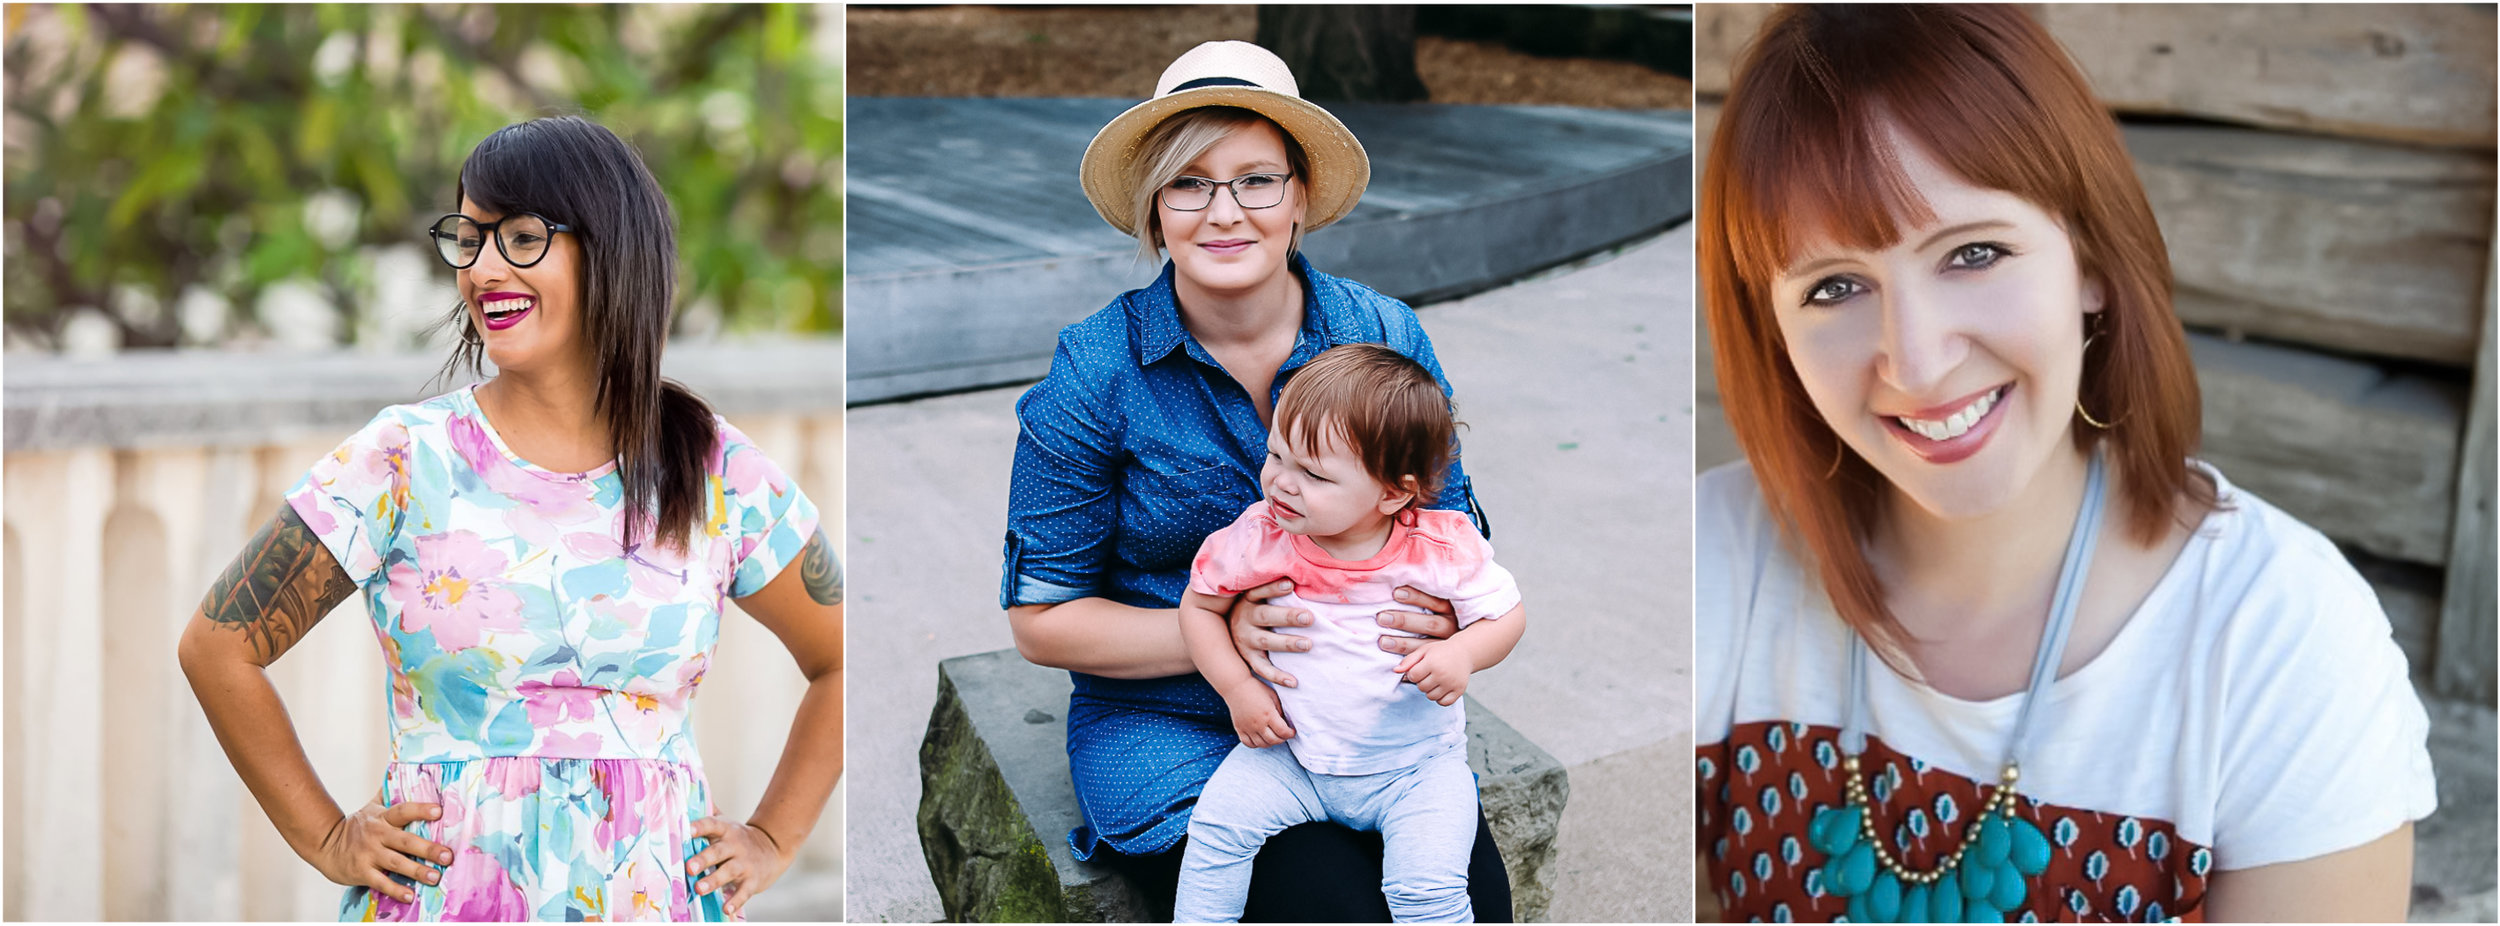 birth-photographers.jpg